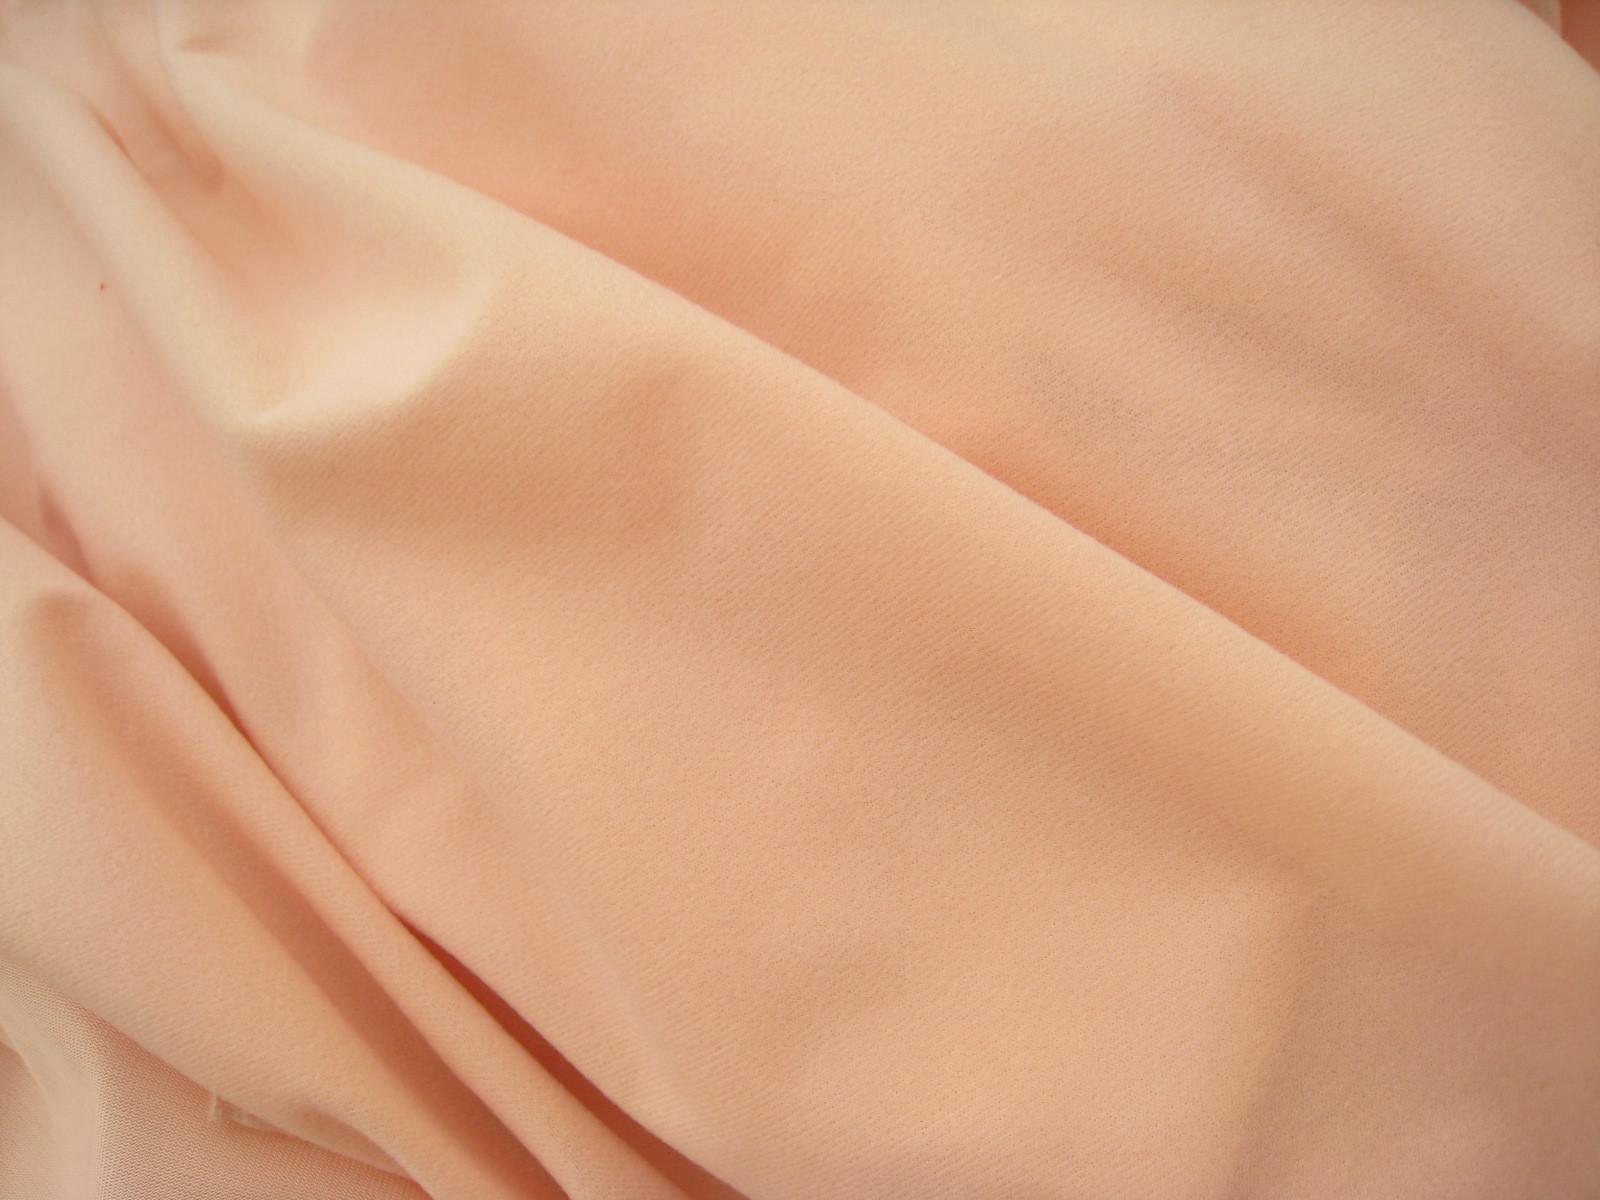 Skin Fabric For Dolls Skin Color 10.5 Dolls Skin